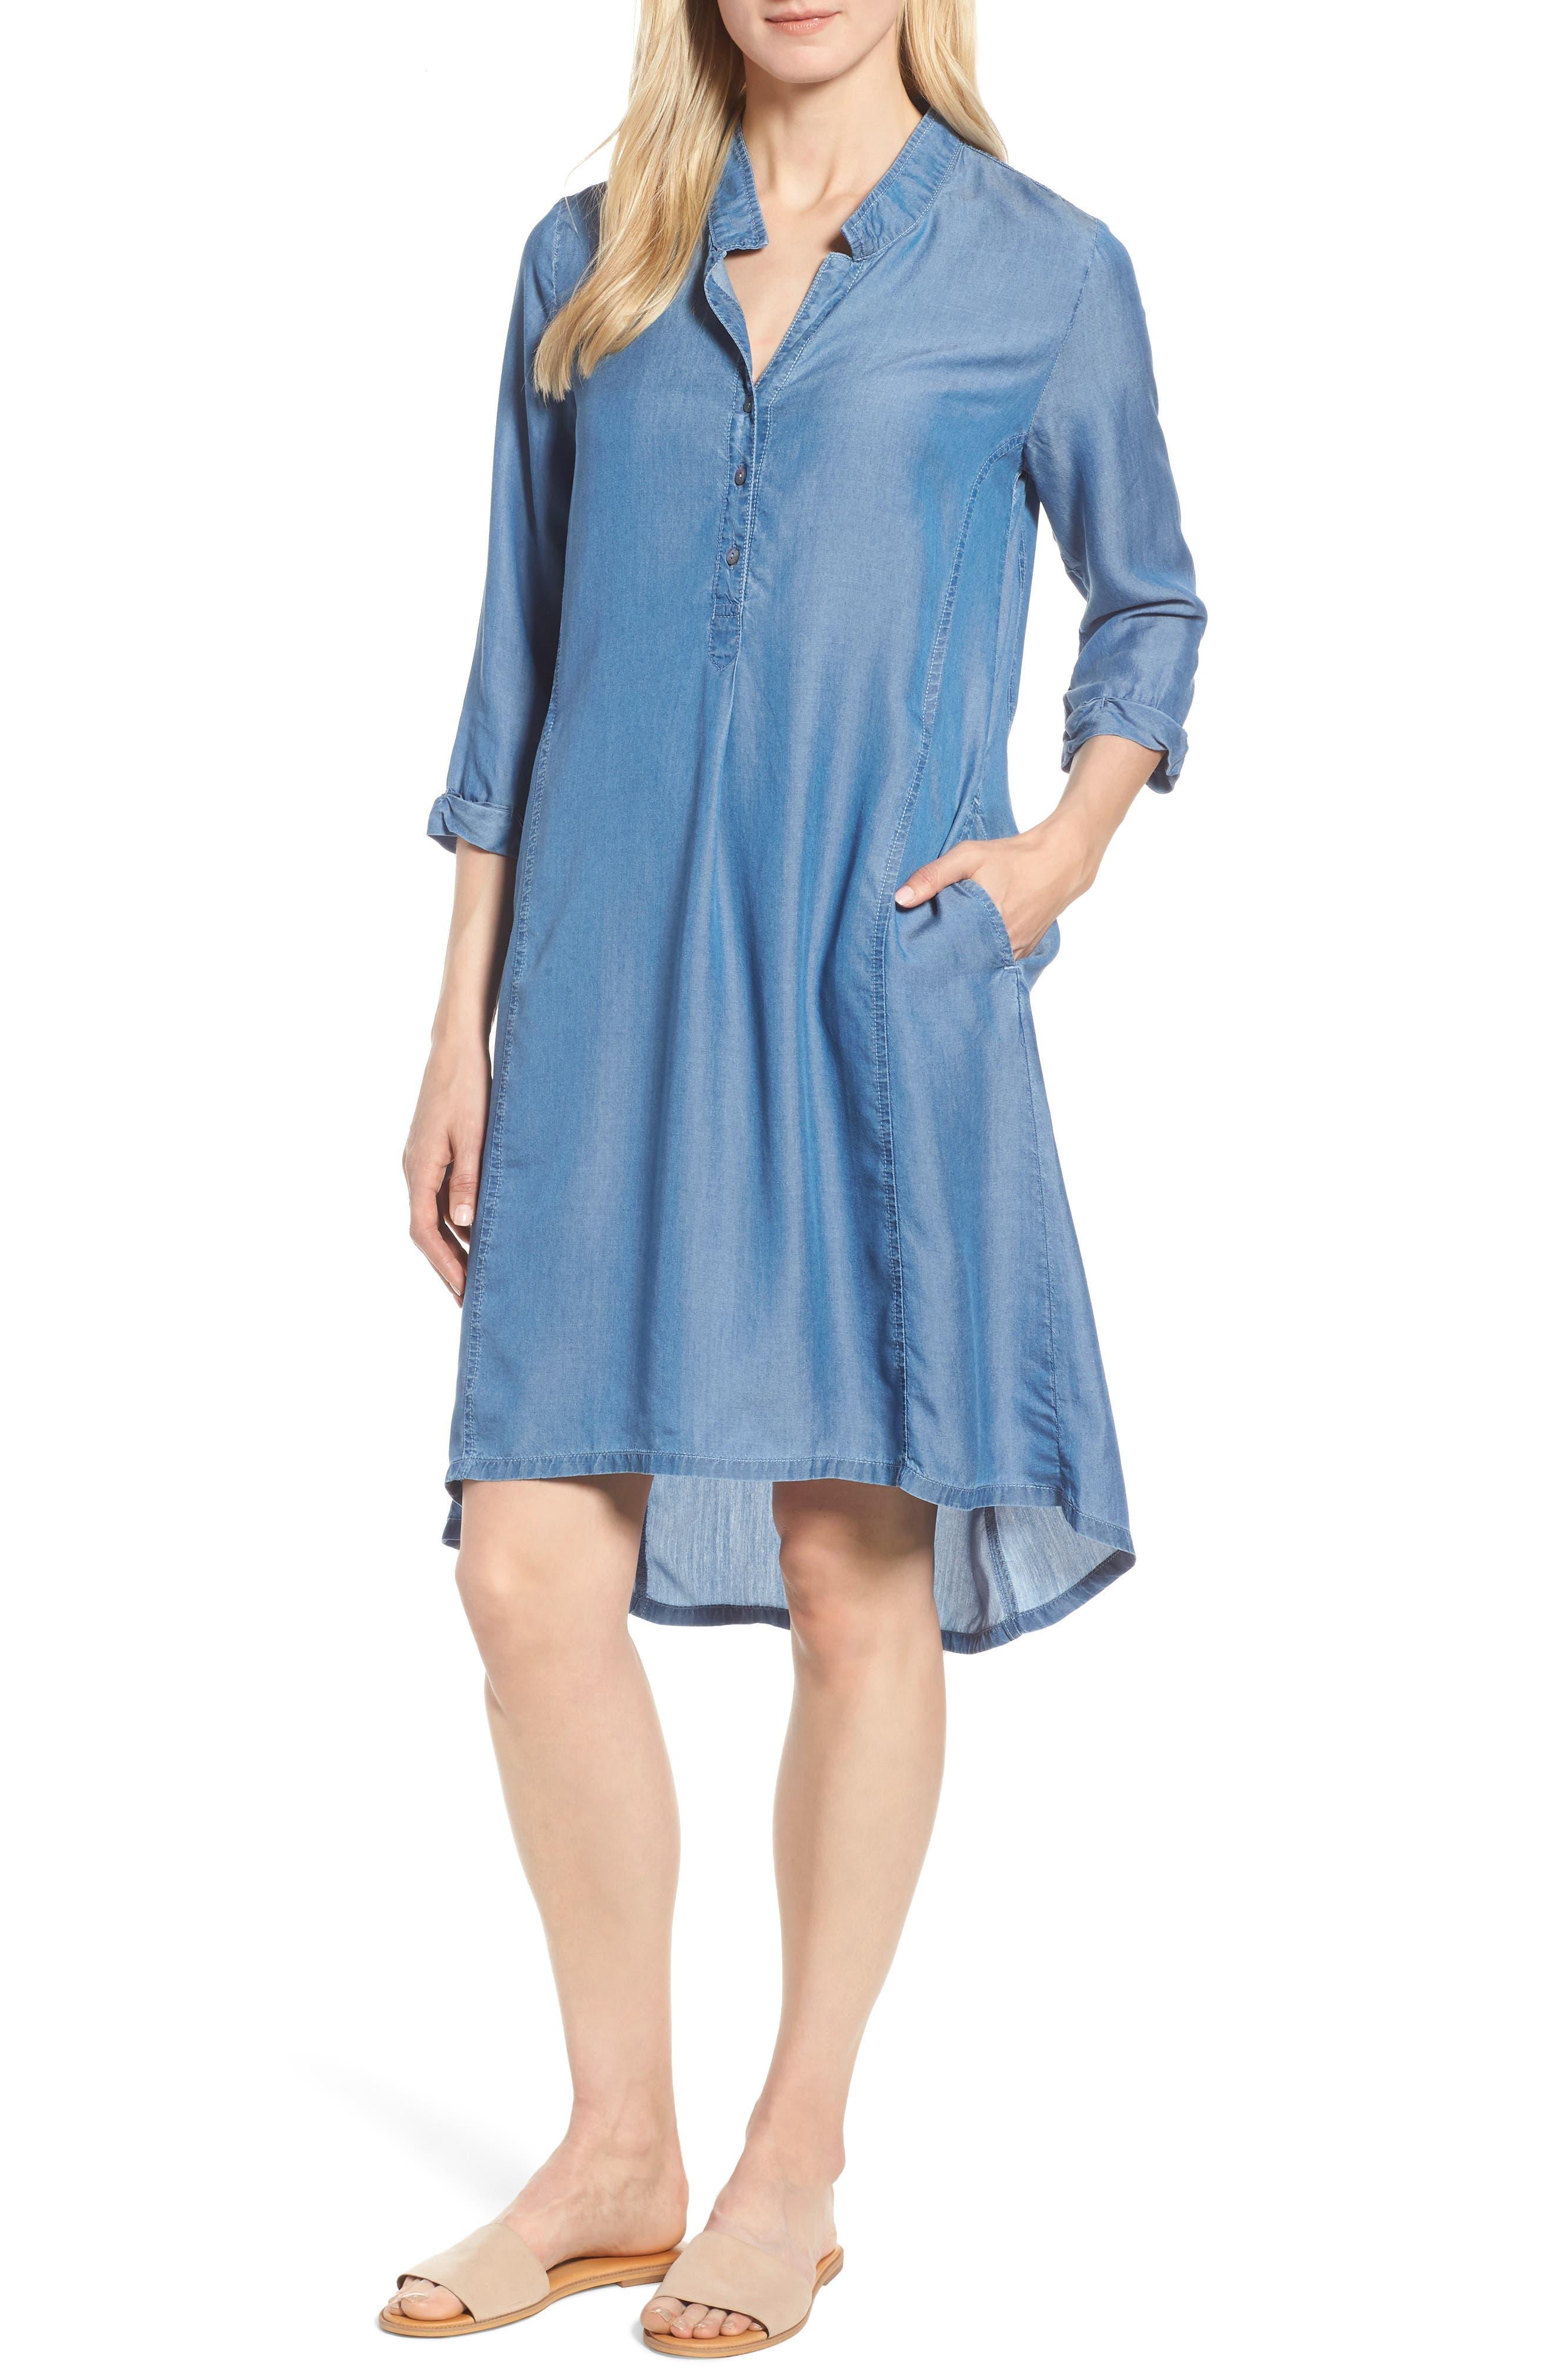 Festival Moonlit Tunic Dress,                             Main thumbnail 1, color,                             Blue Haze